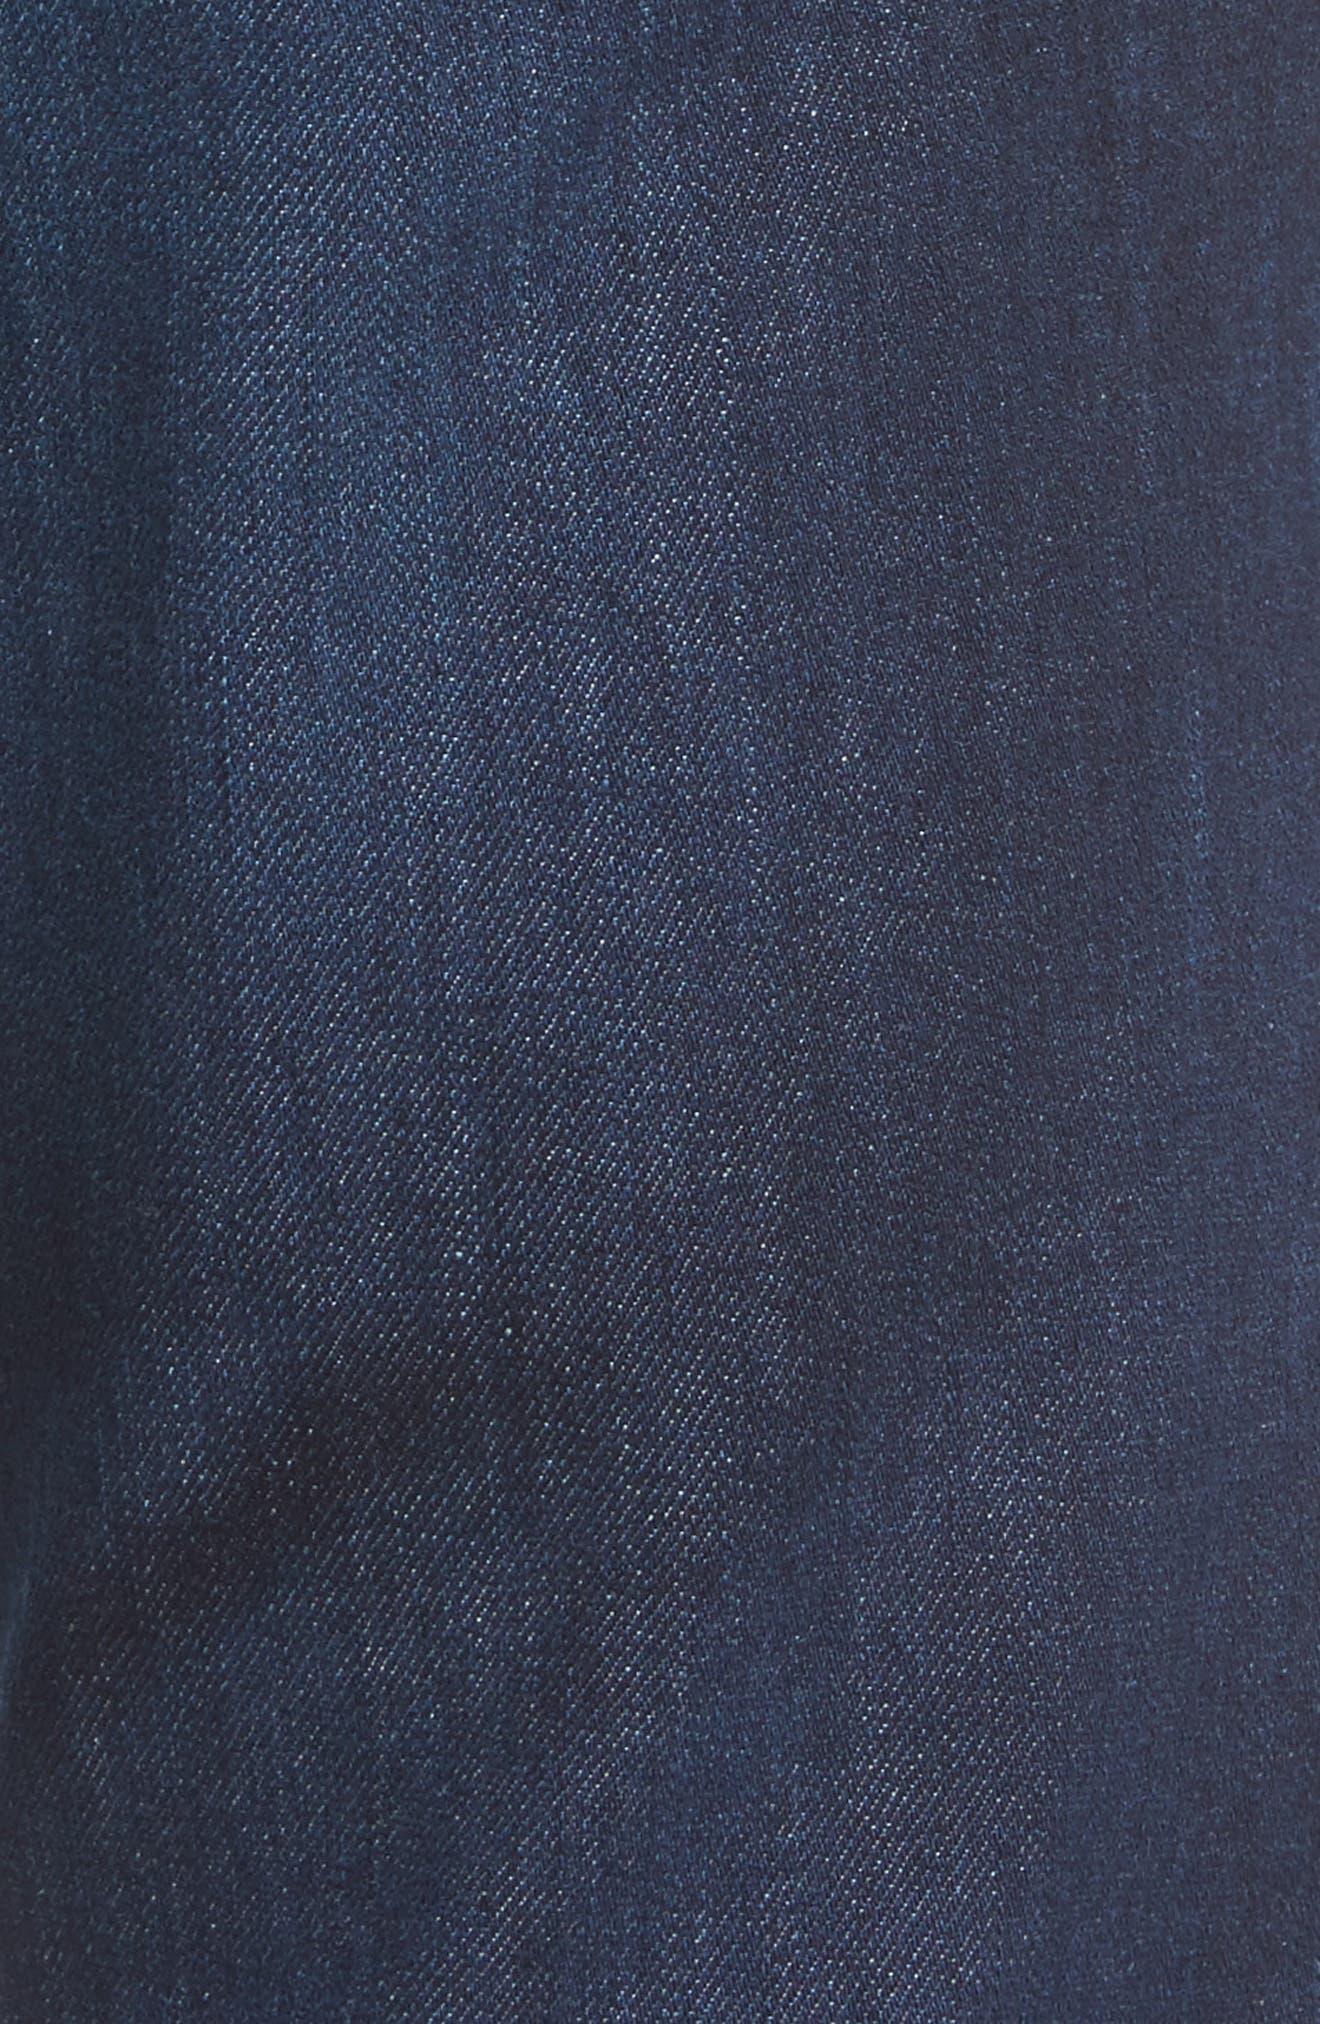 Dylan Skinny Jeans,                             Alternate thumbnail 5, color,                             5 Years Porter